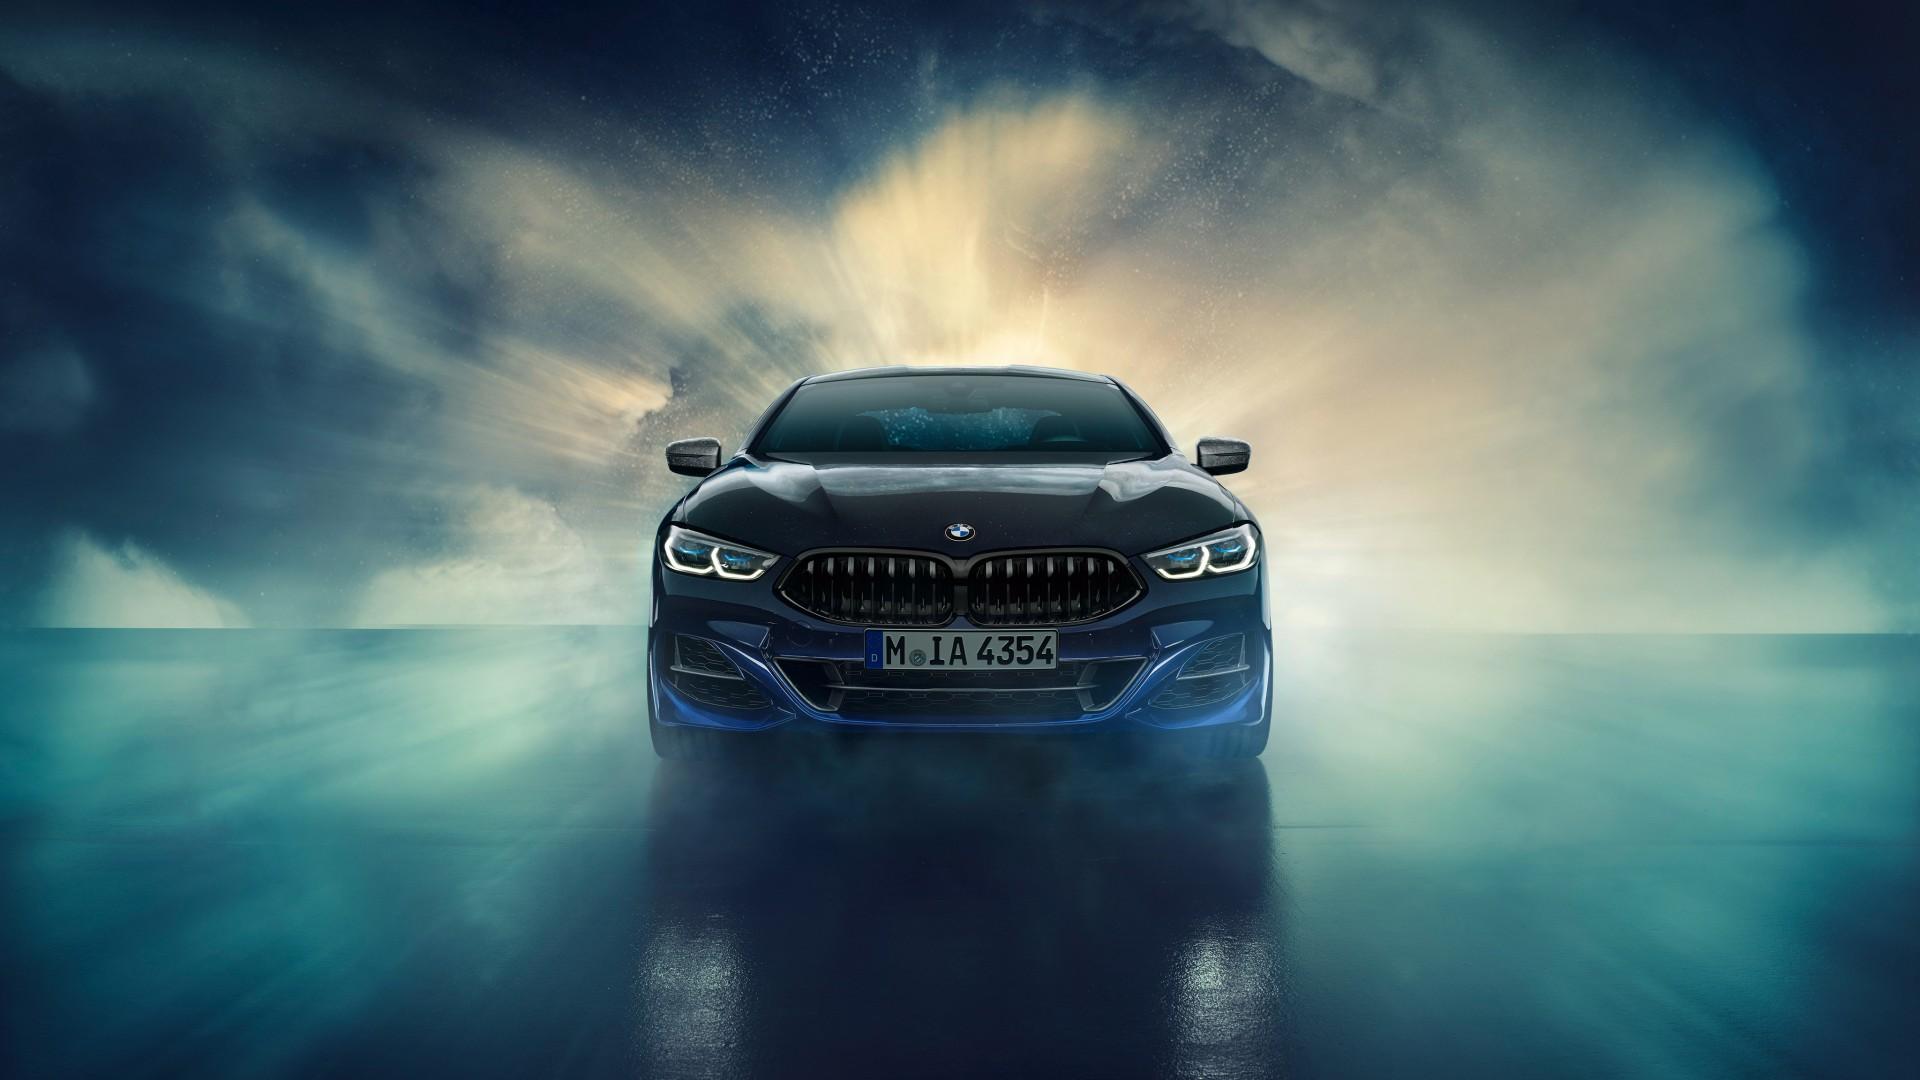 BMW Individual M850i xDrive Night Sky 2019 4K 4 Wallpaper ...